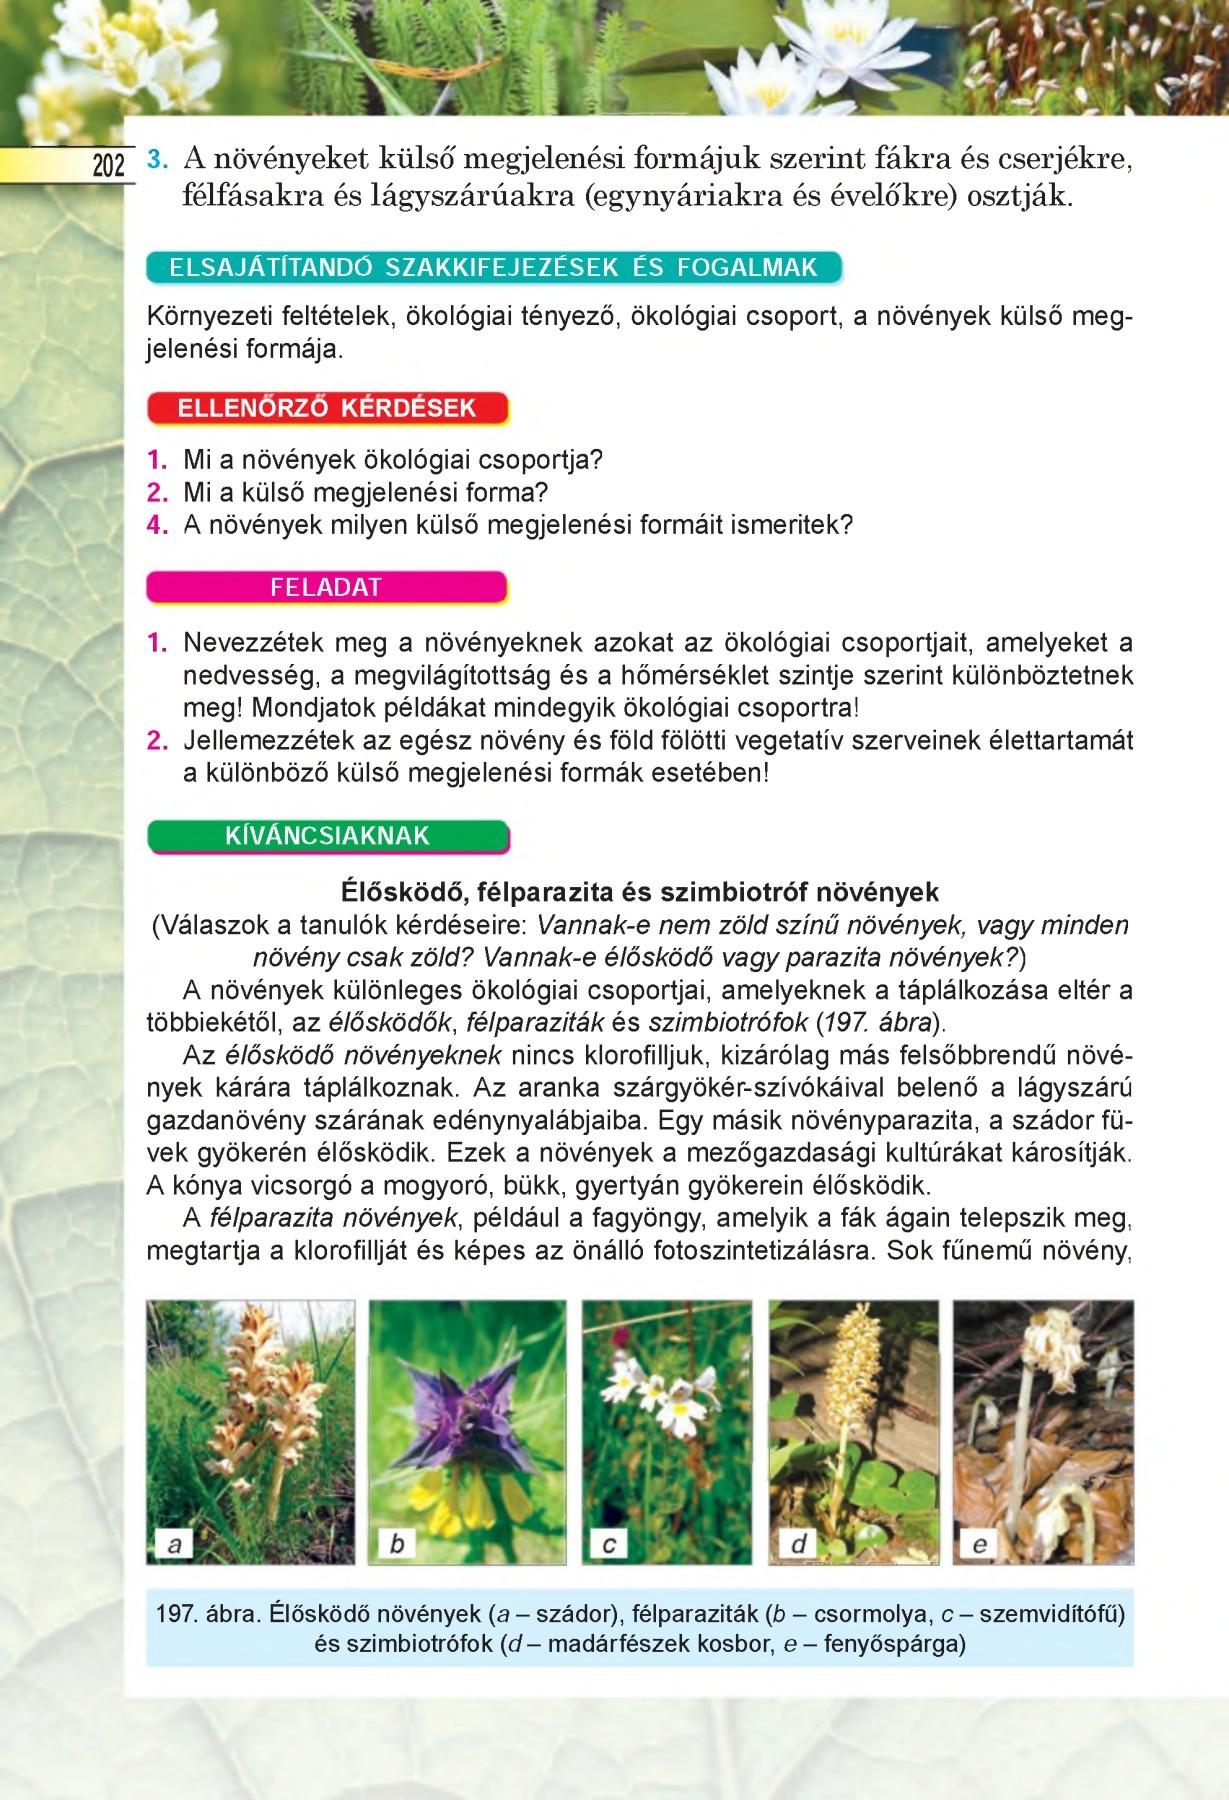 gomba parazita a növényi növényekben